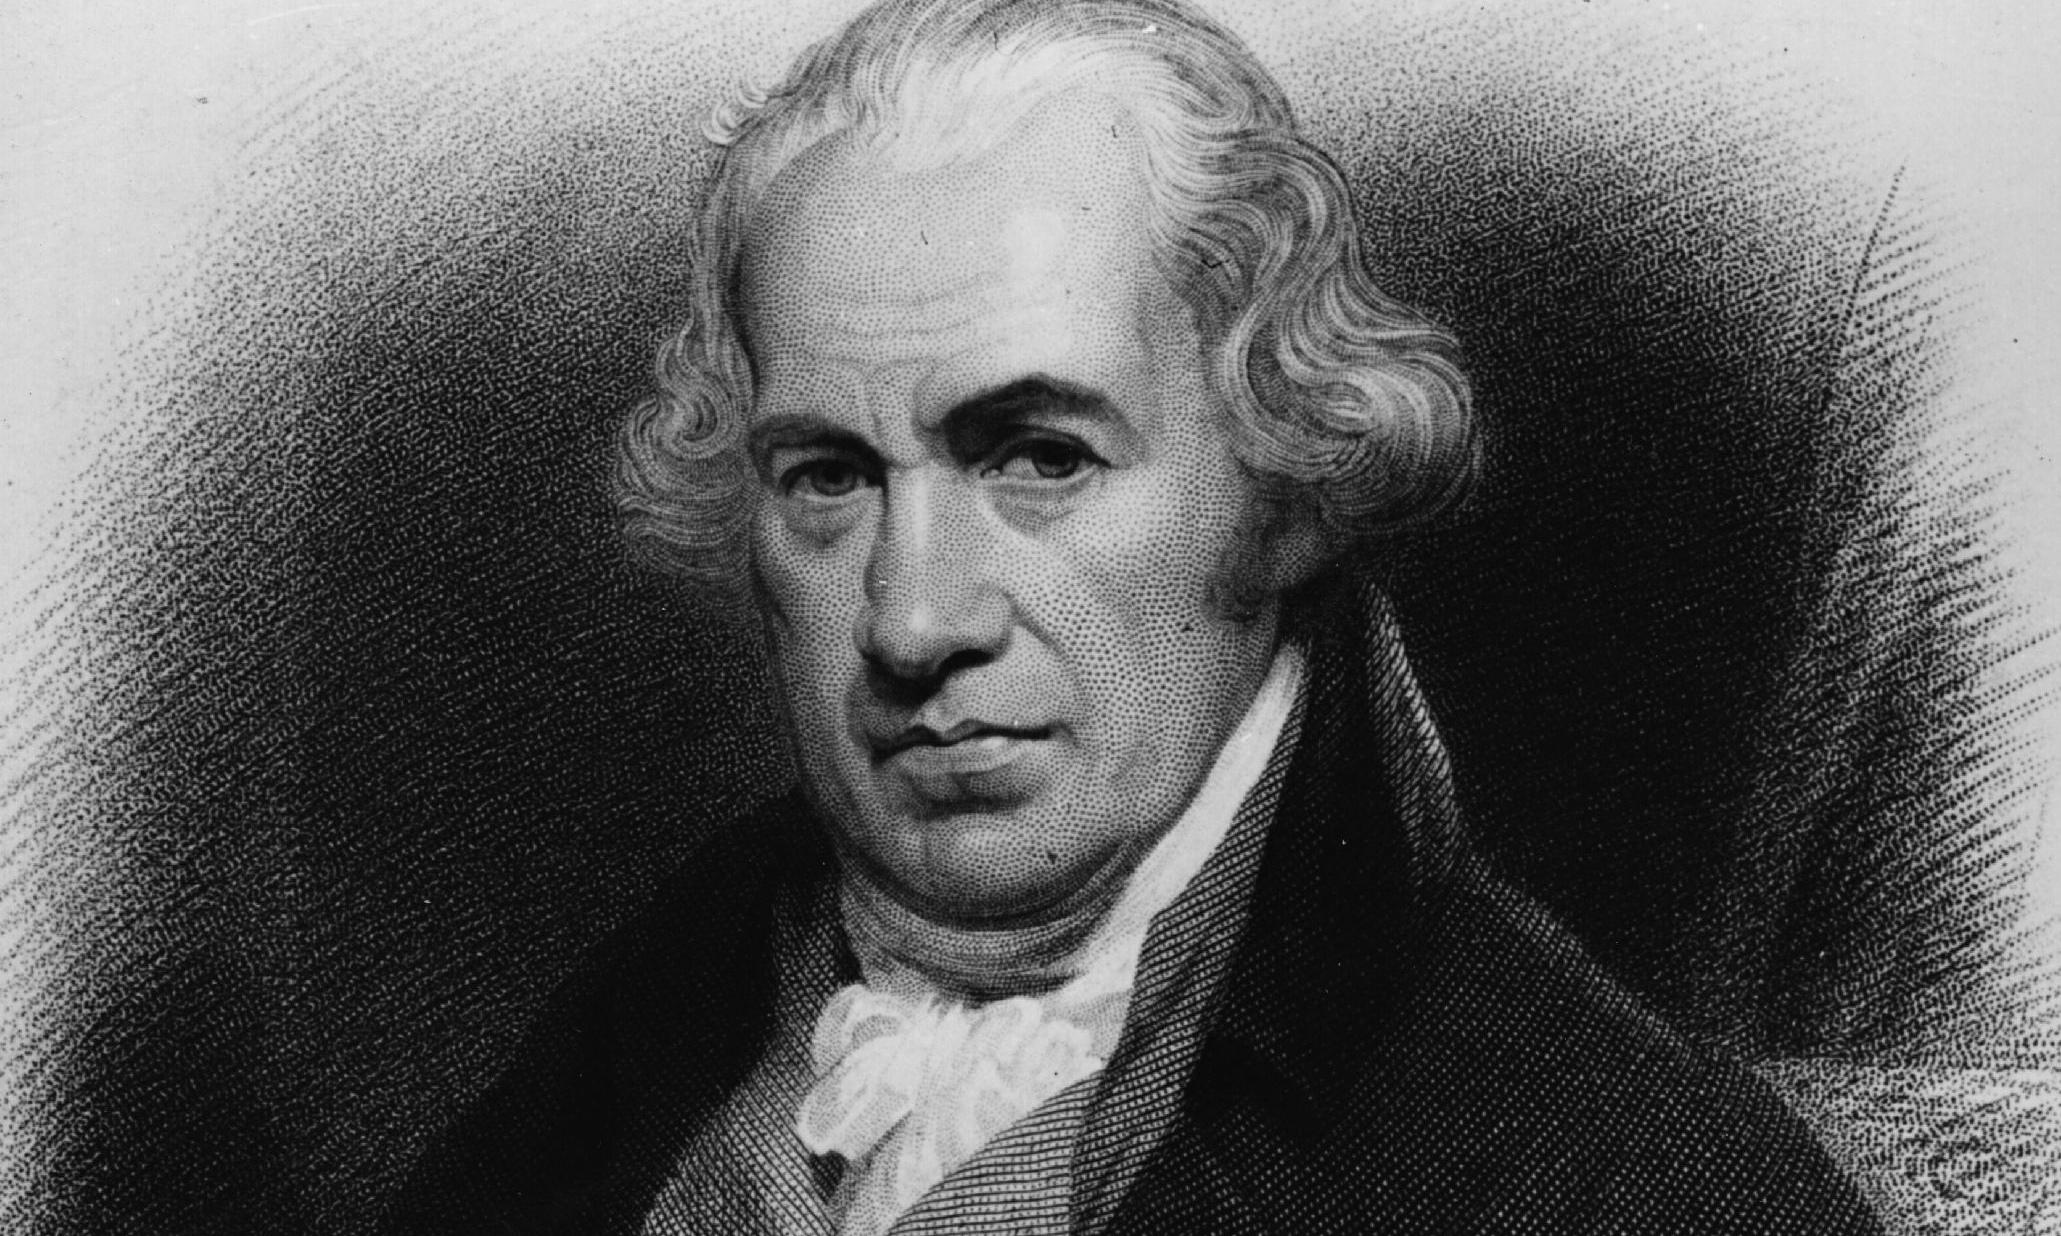 Nhà khoa học James Watt